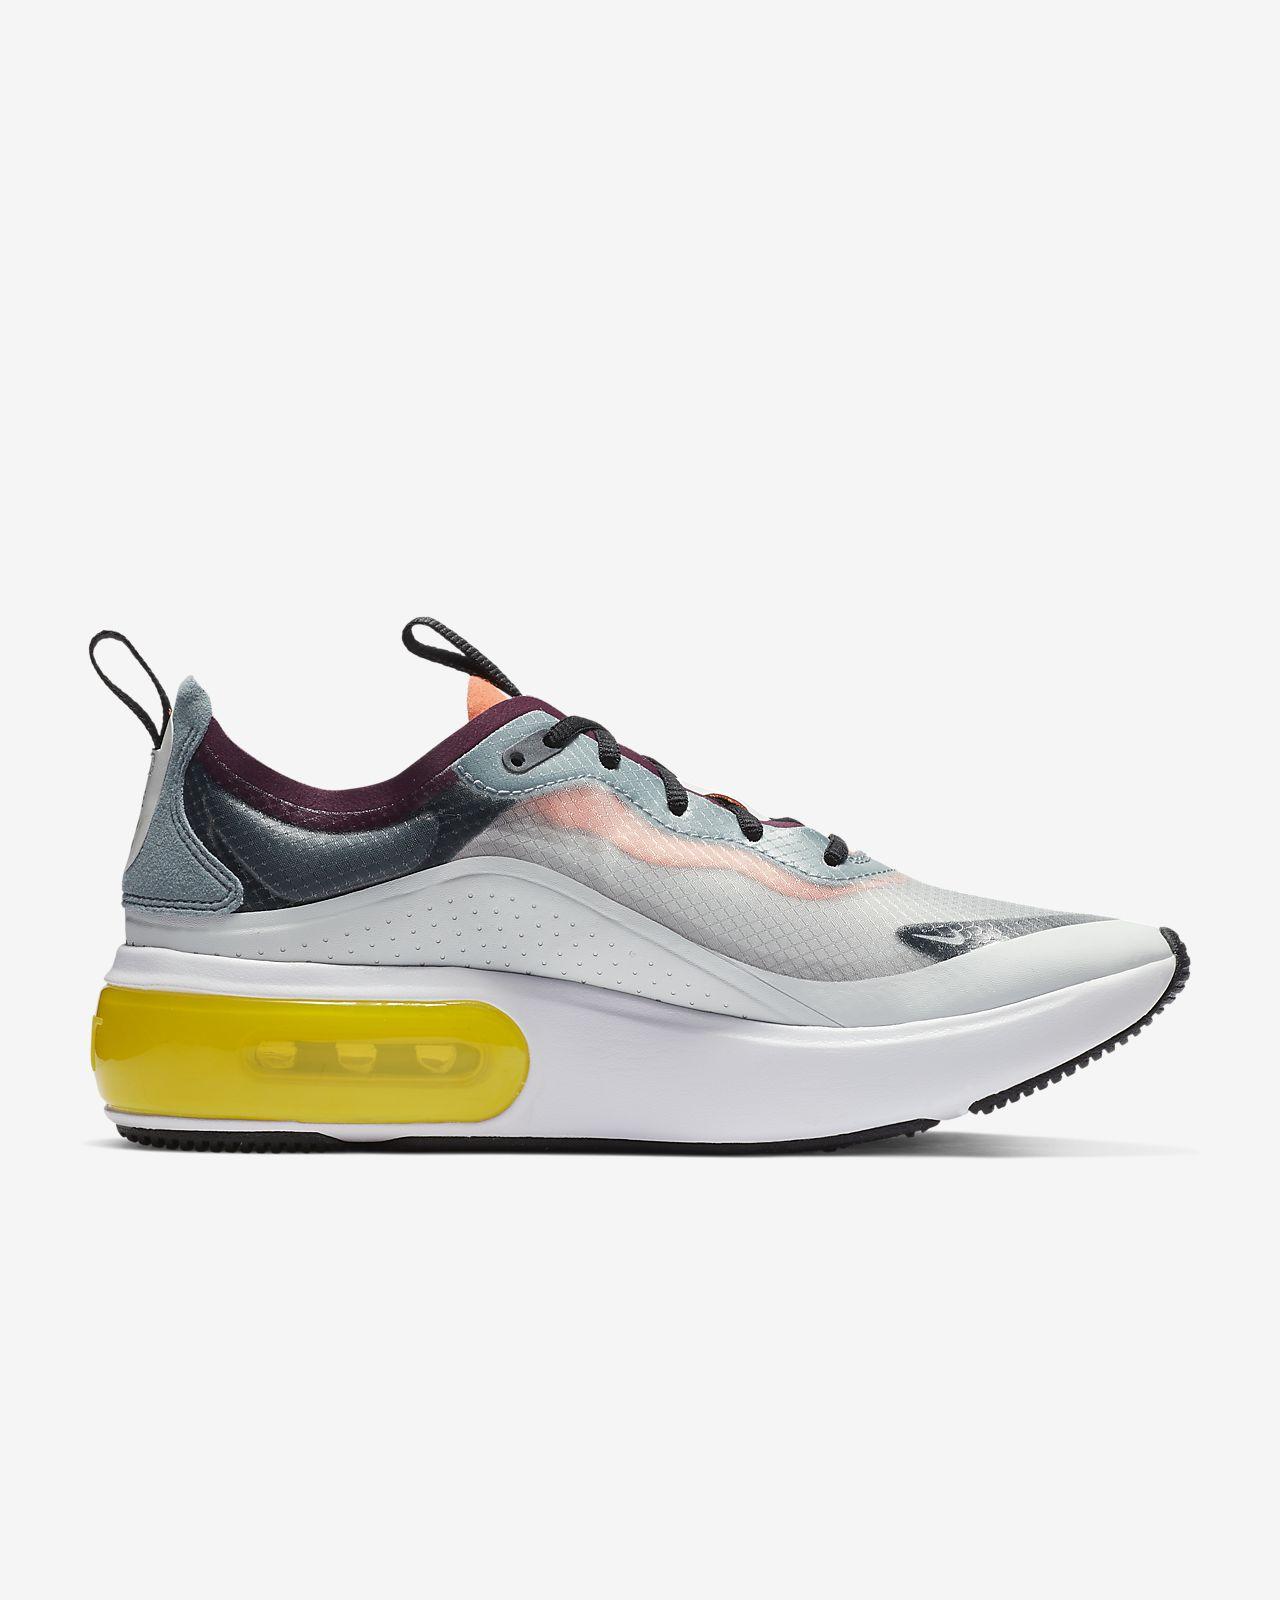 8d8a94f835 Nike Air Max Dia SE QS Shoe. Nike.com AU